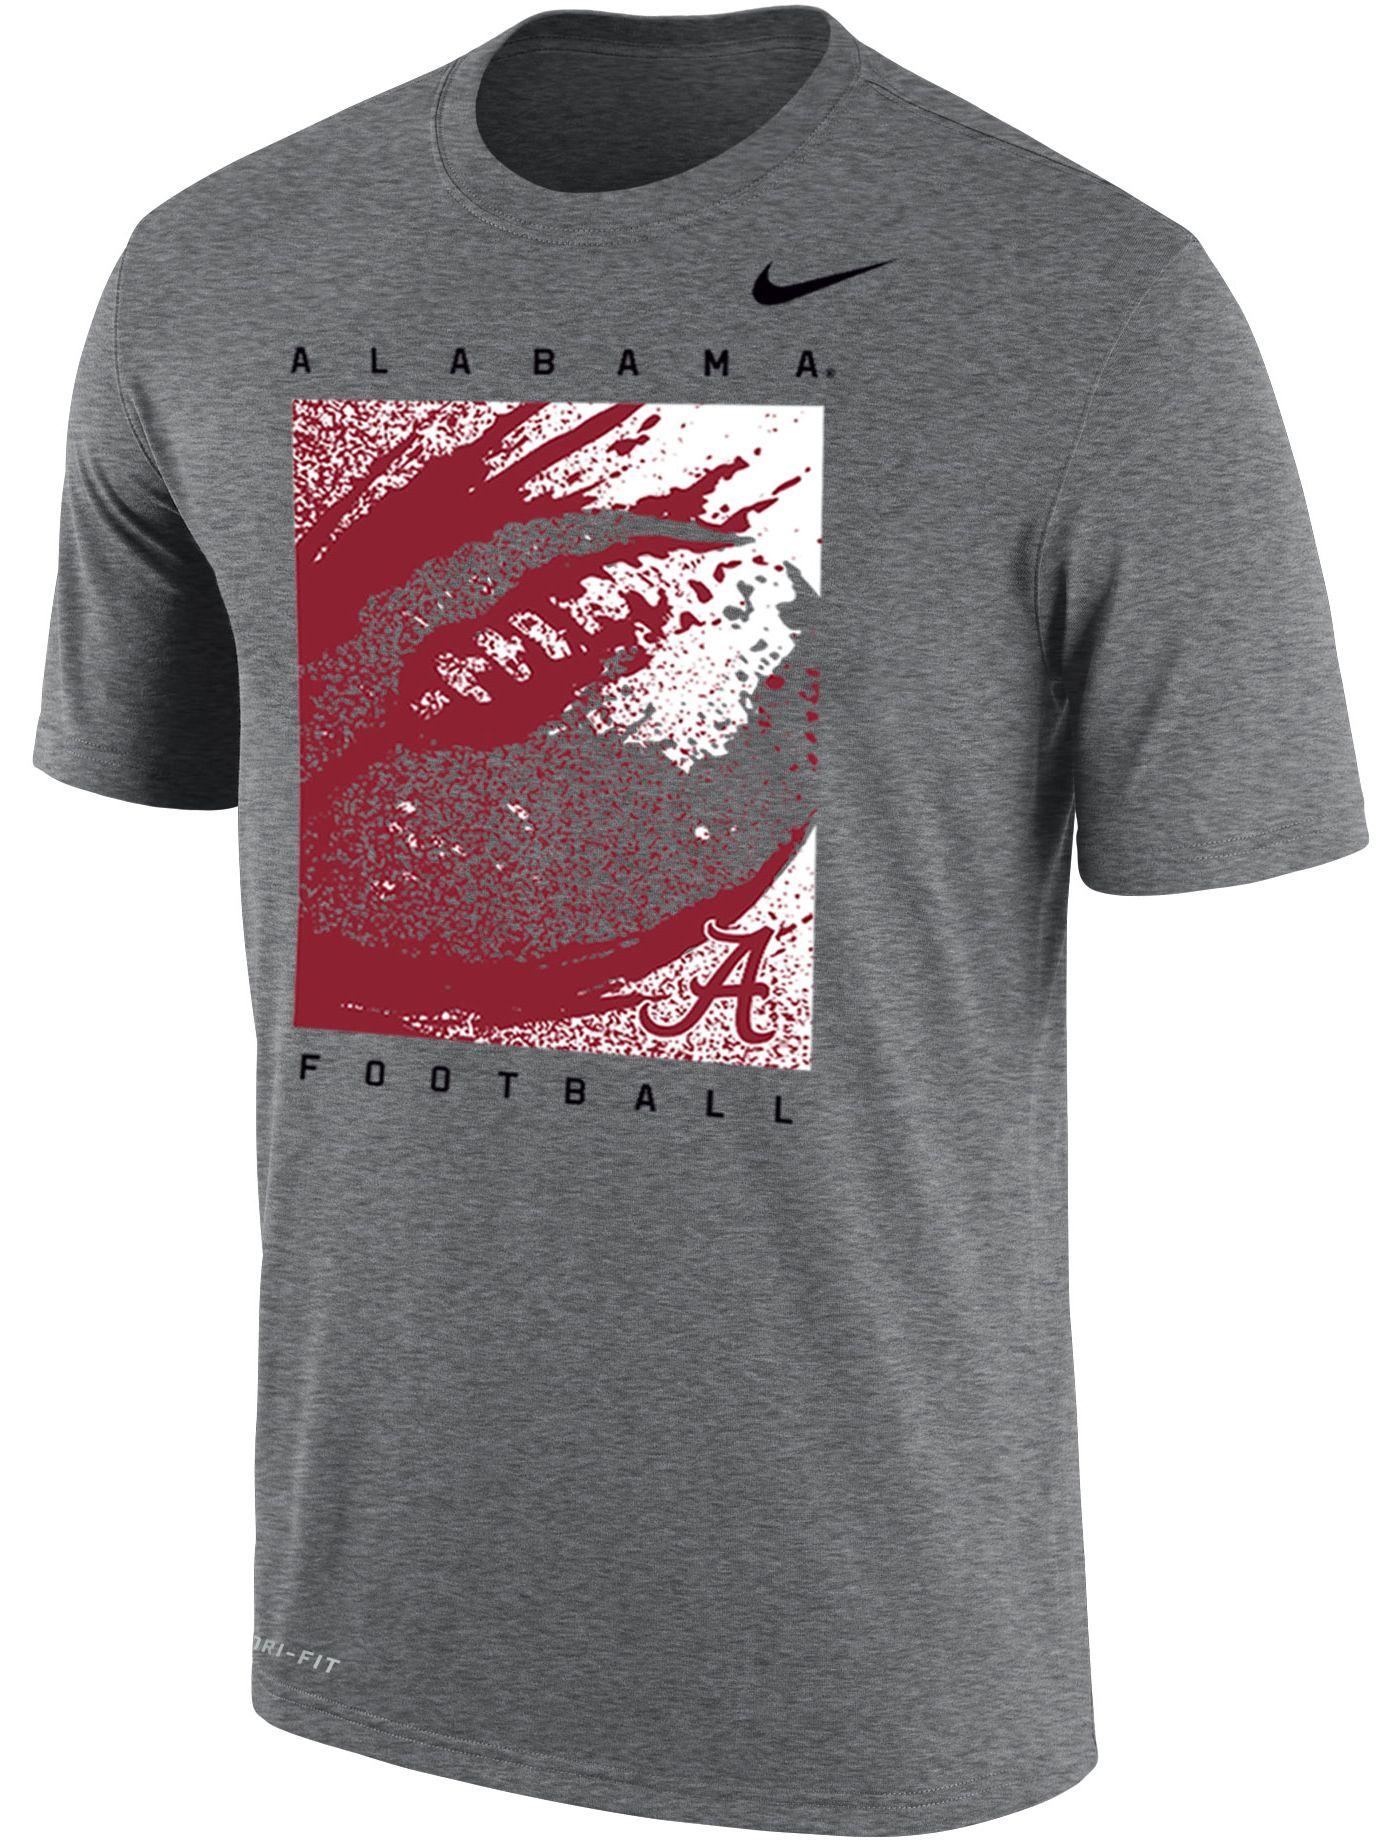 Nike Men's Alabama Crimson Tide Grey Dri-FIT Cotton Football T-Shirt